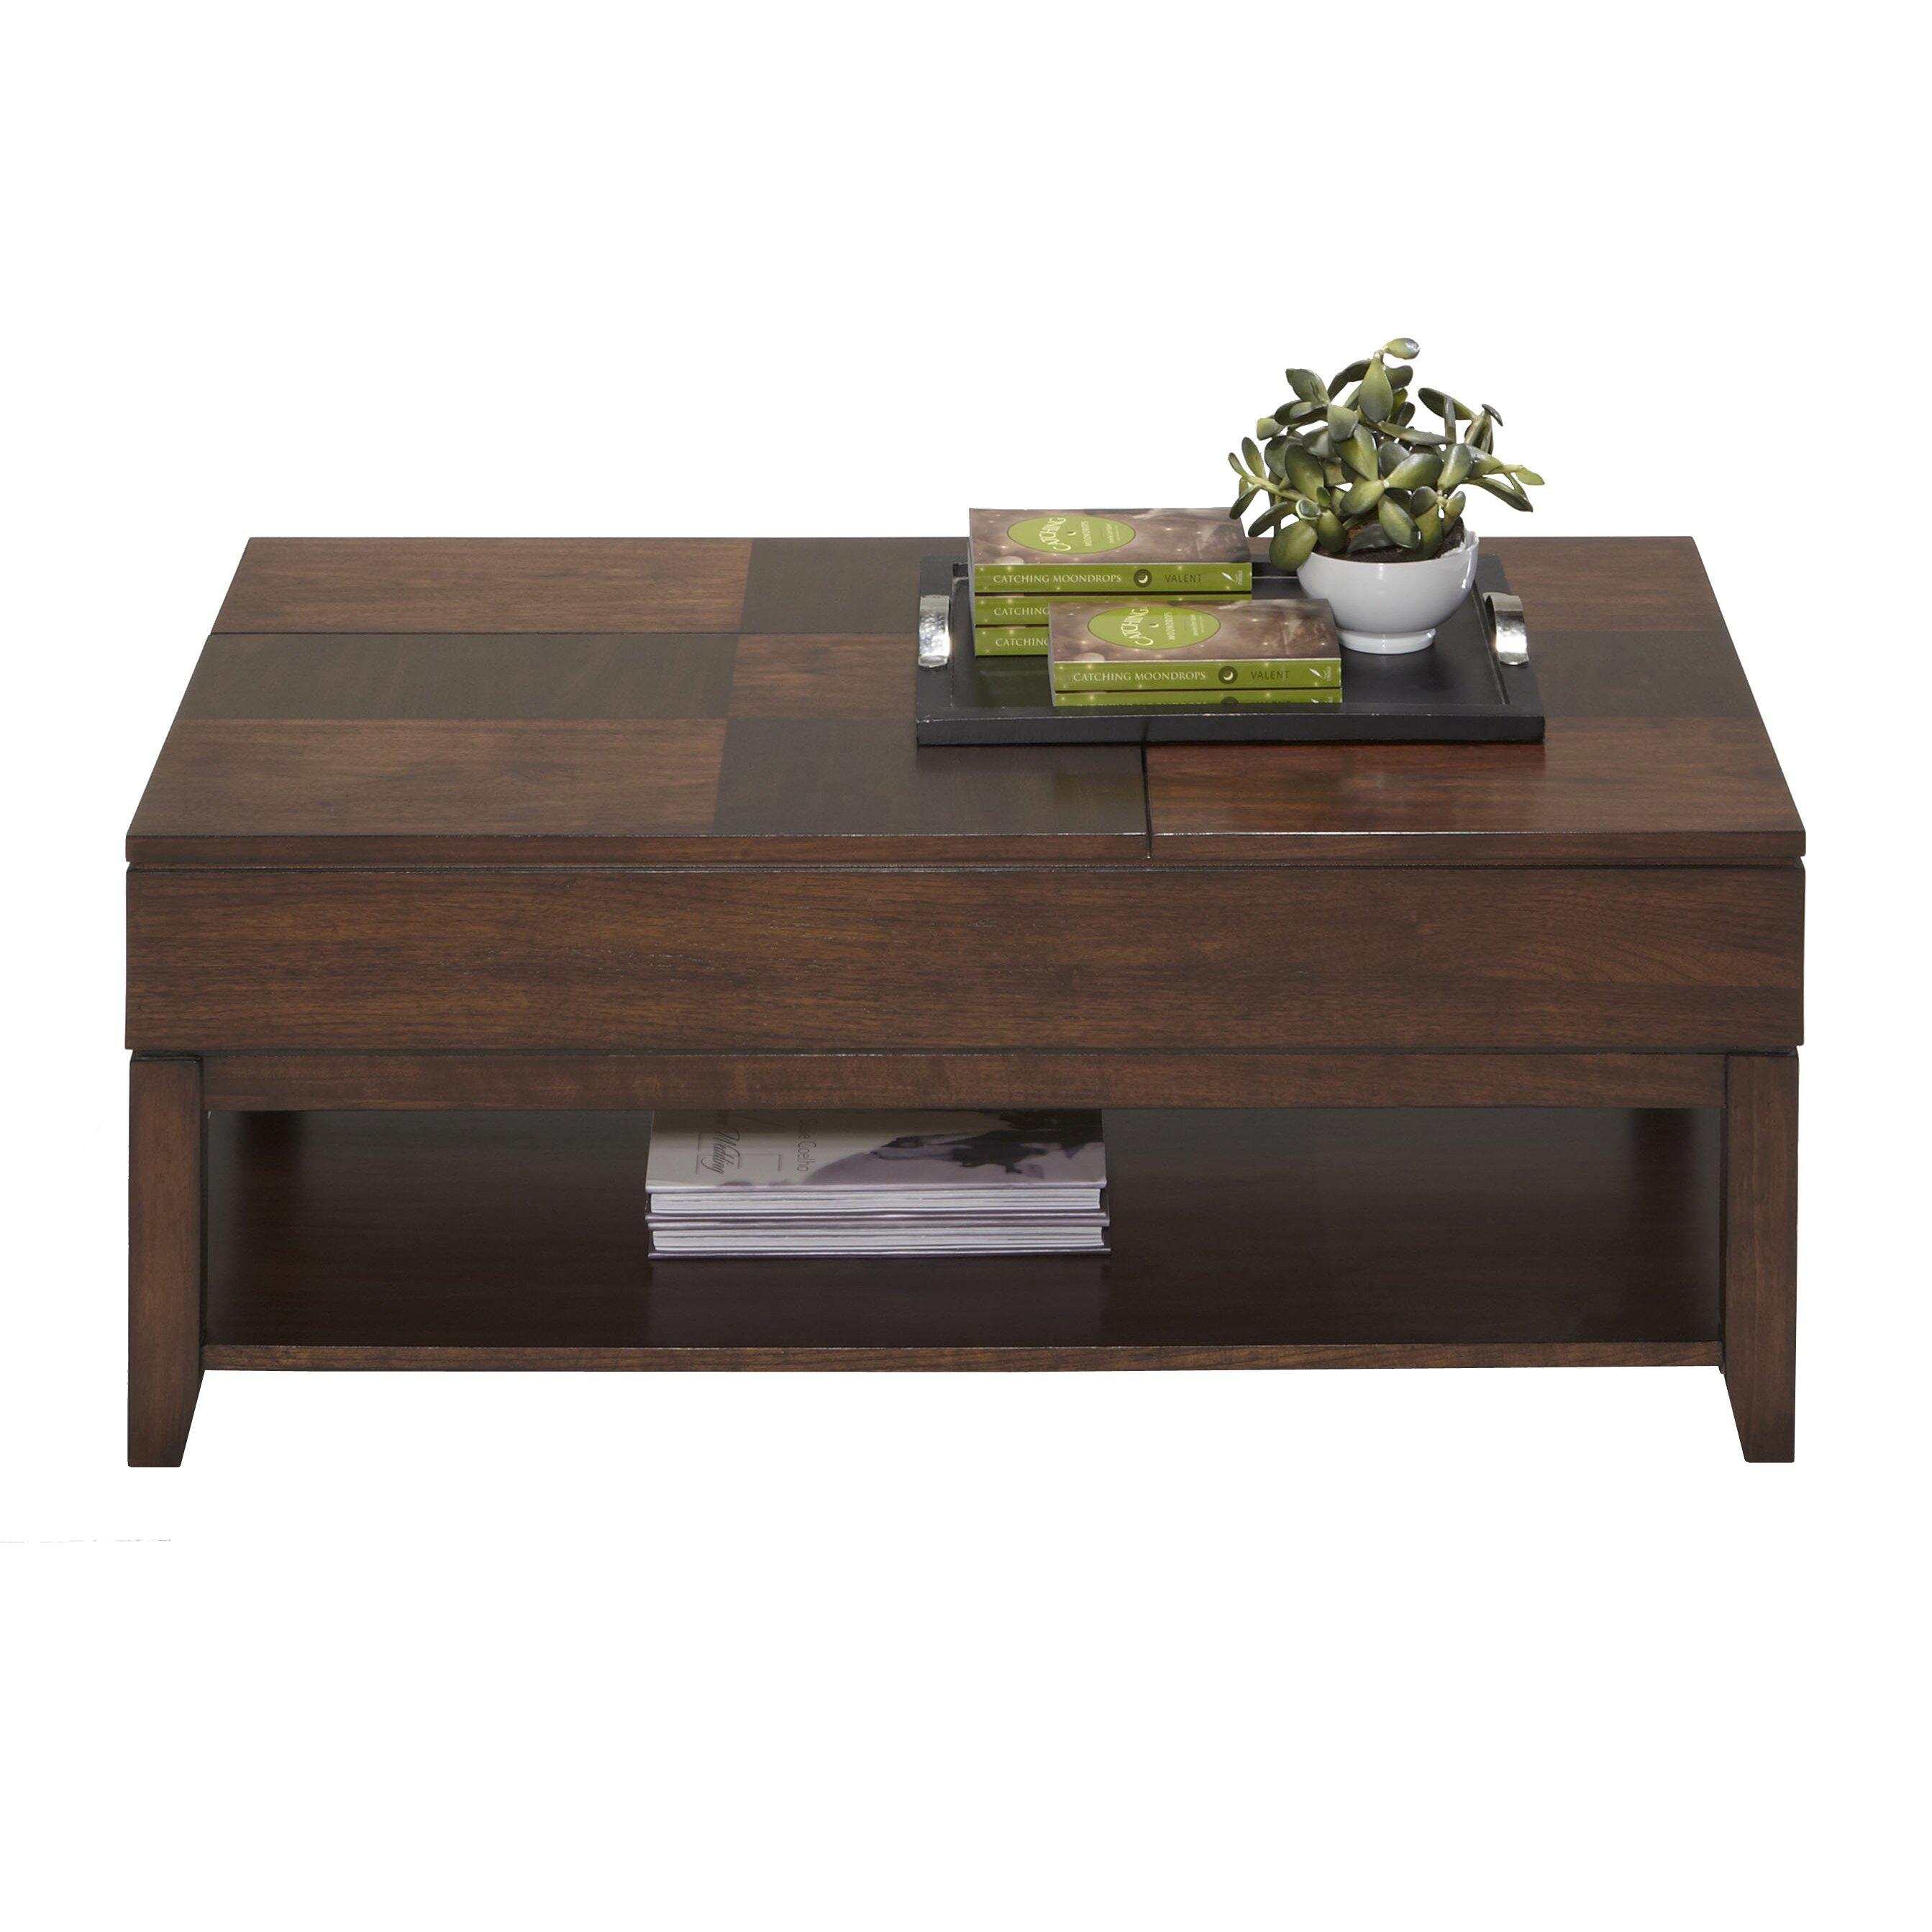 Dual Lift Top Coffee Table Progressive Furniture Daytona Coffee Table With Double Lift Top